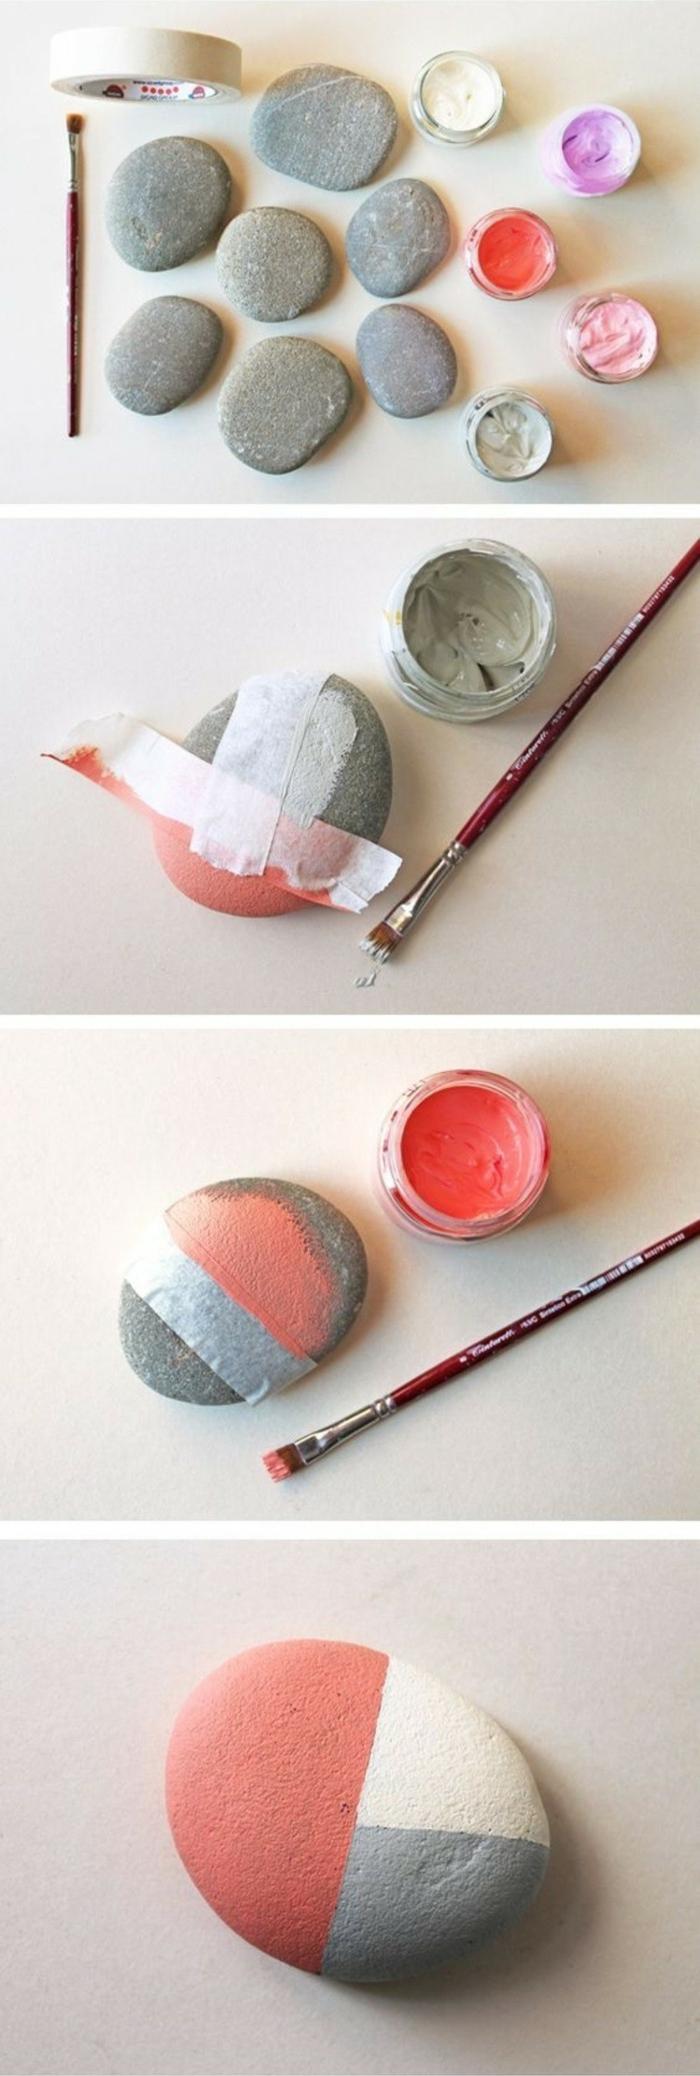 1001 ideas de piedras pintadas para ni os y adultos for Tecnica para pintar piedras